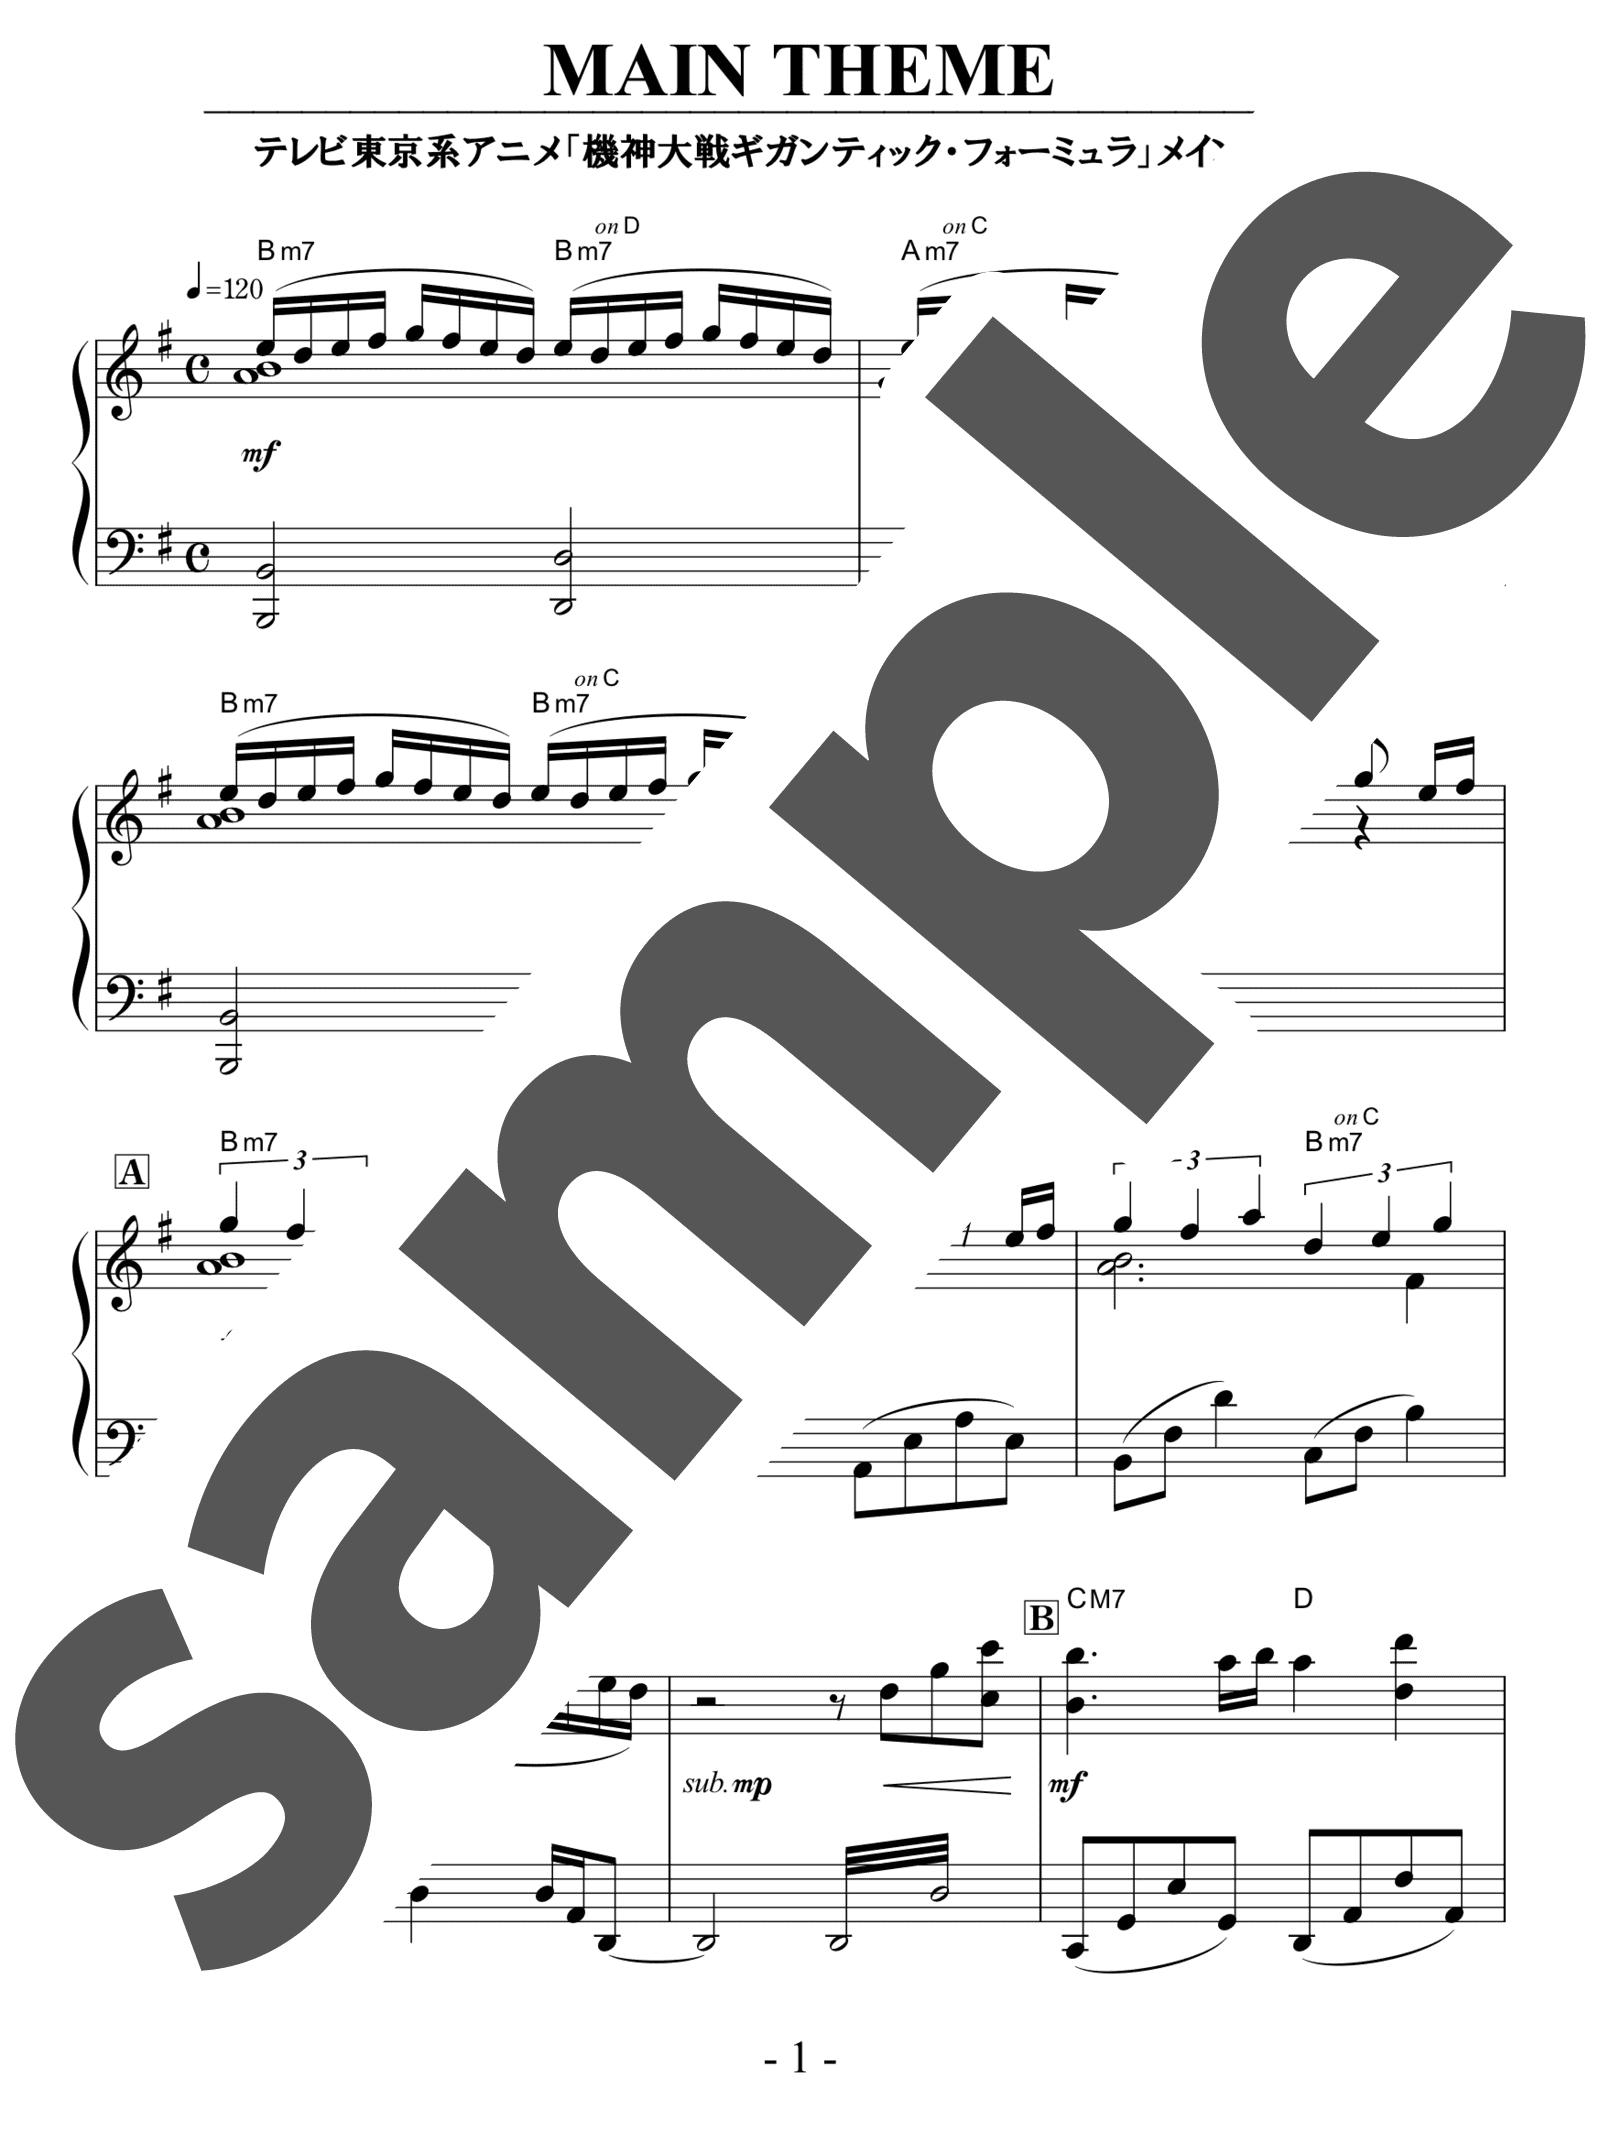 「MAIN THEME」のサンプル楽譜